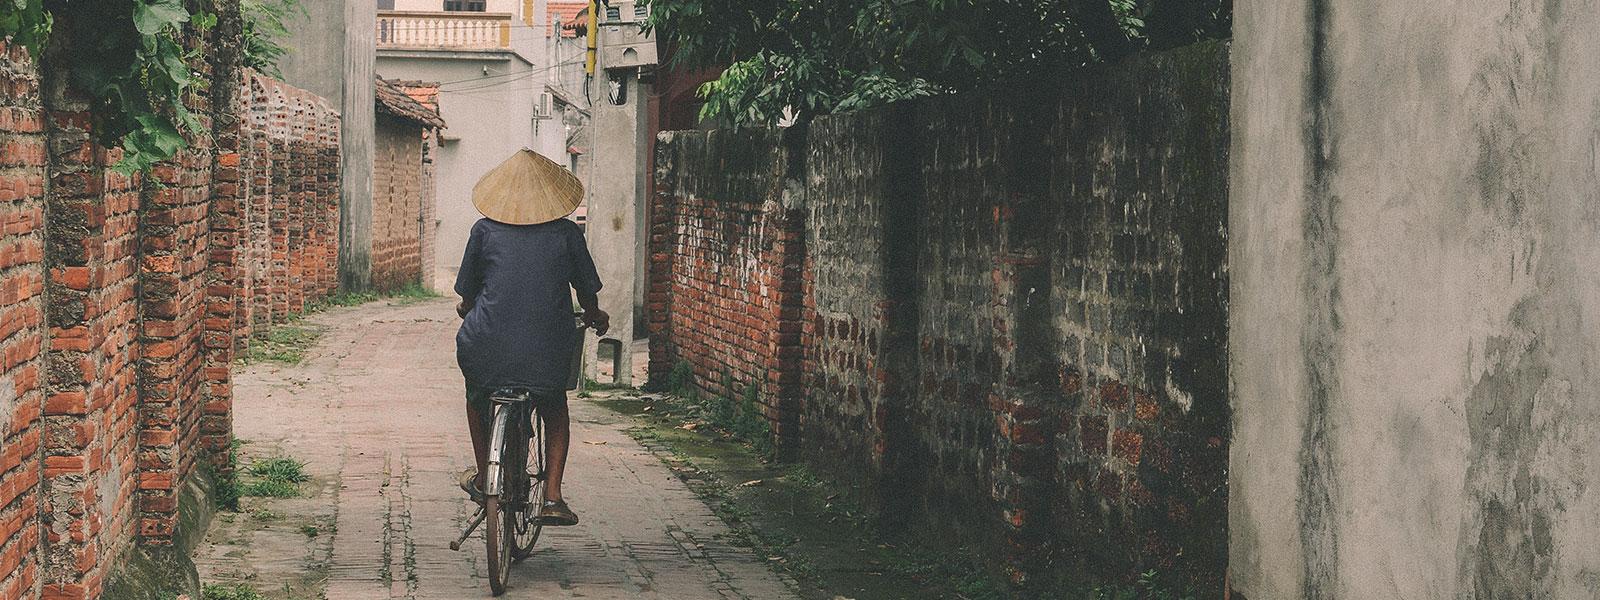 A person riding a bike through a quiet lane